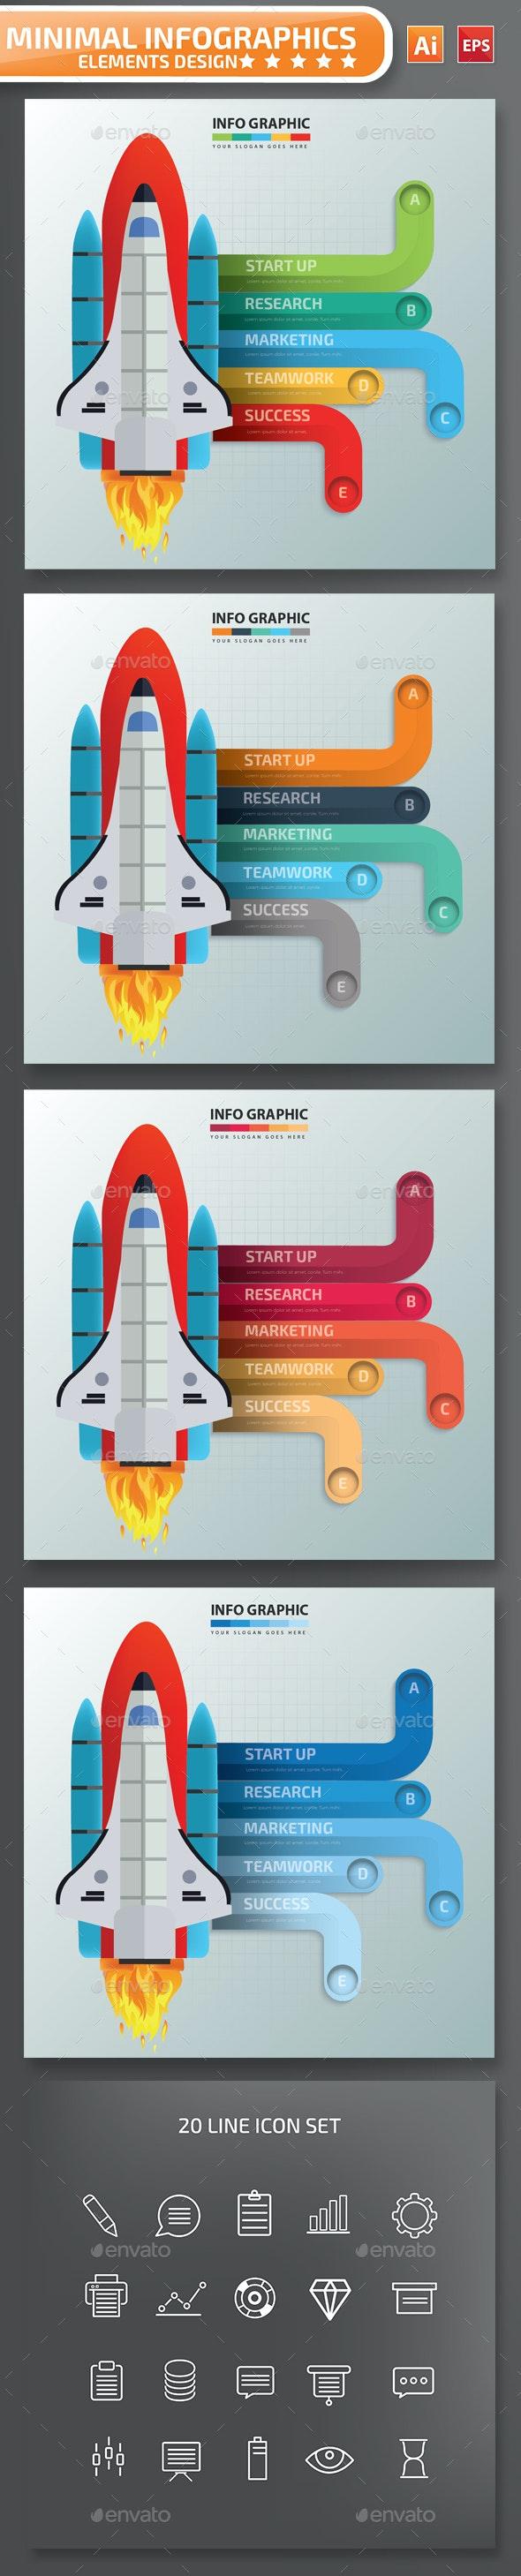 Minimal Start up infographic Design